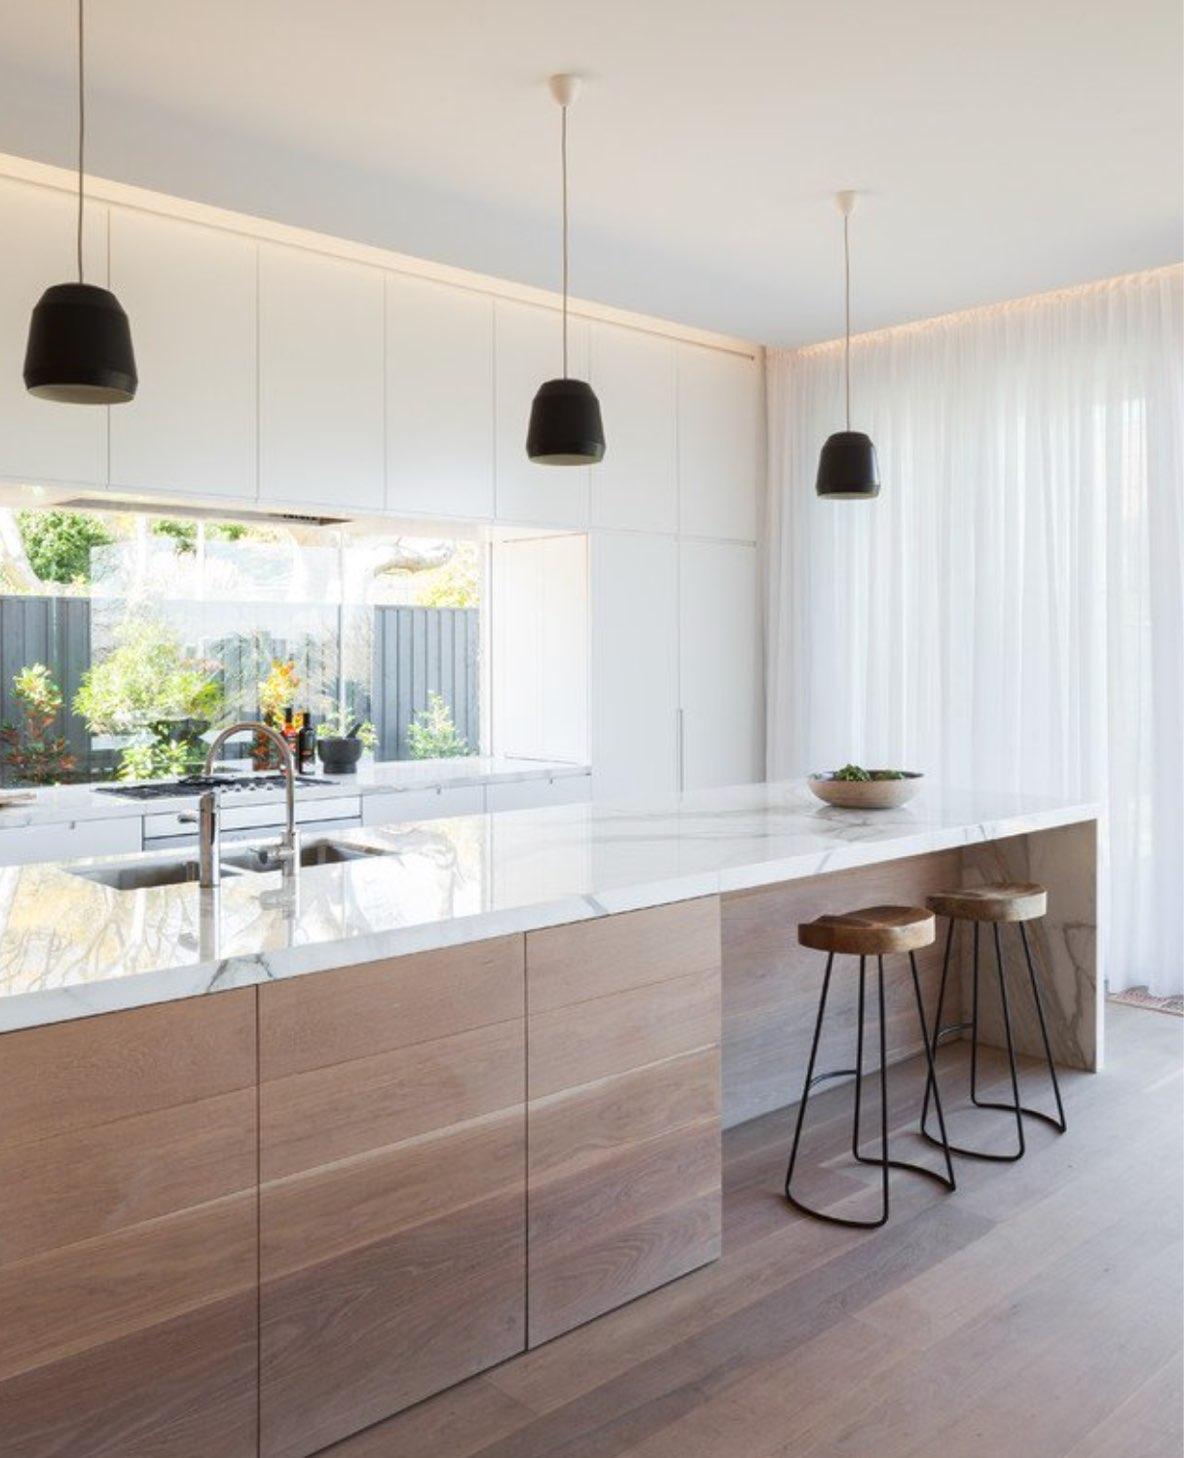 16 Staggering Scandinavian Kitchen Designs For Your Modern House.jpg